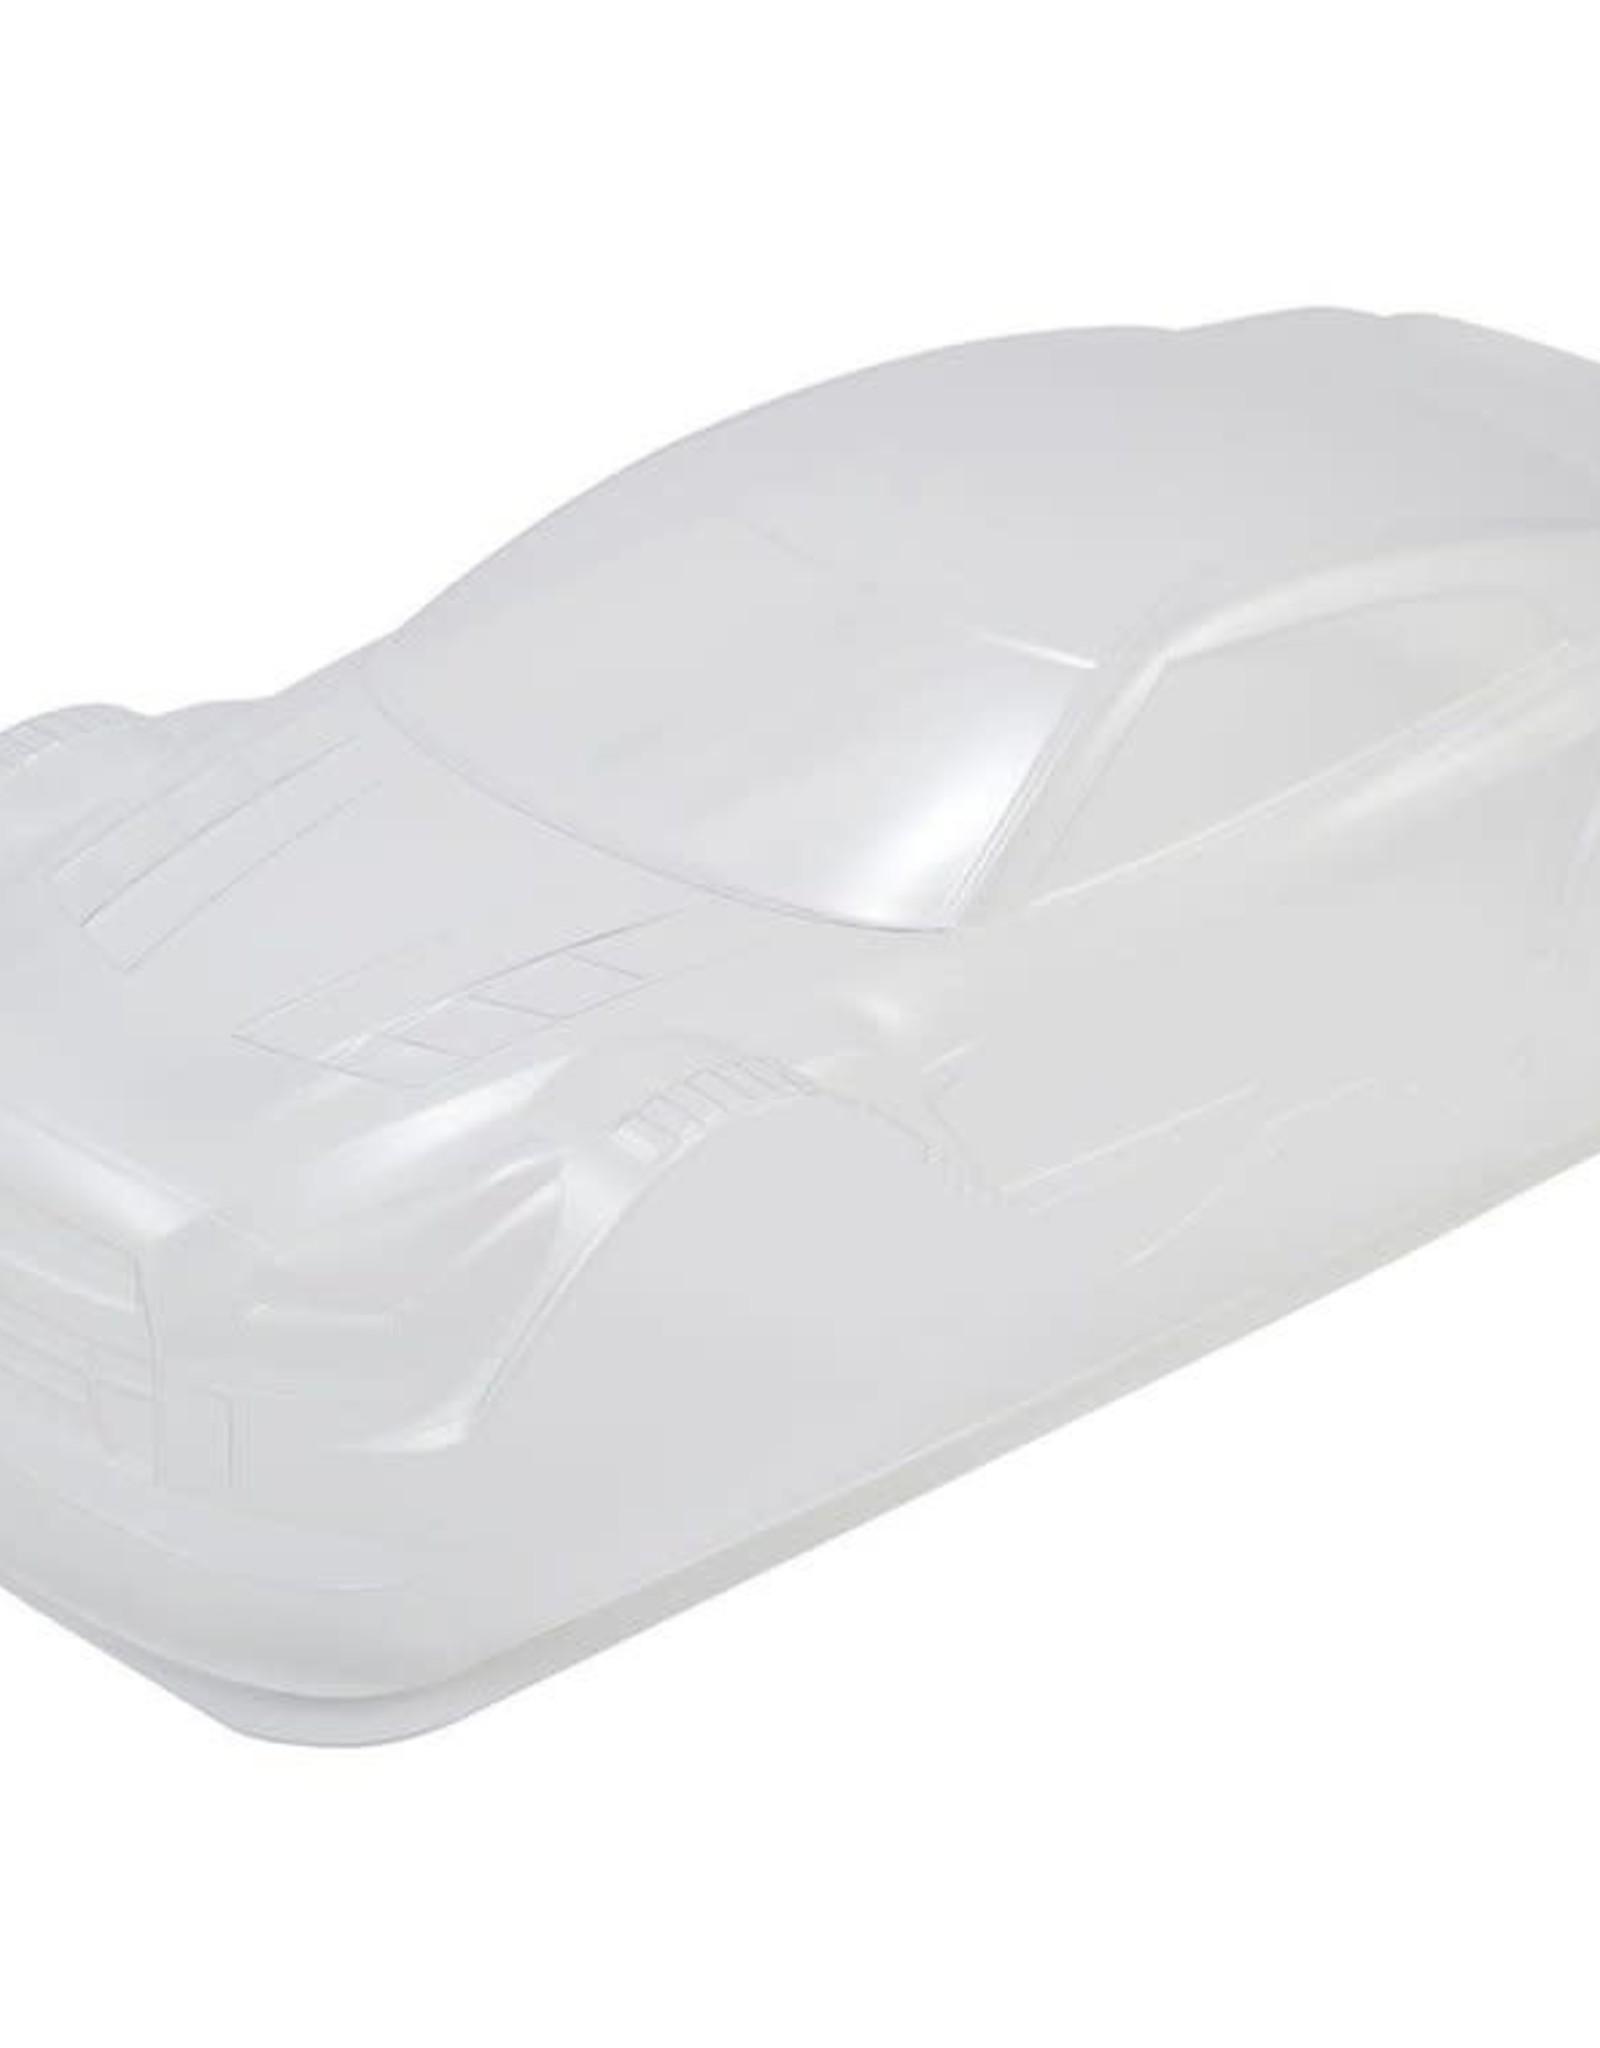 Tamiya Tamiya Motul Autech GT-R Body Set (Clear)